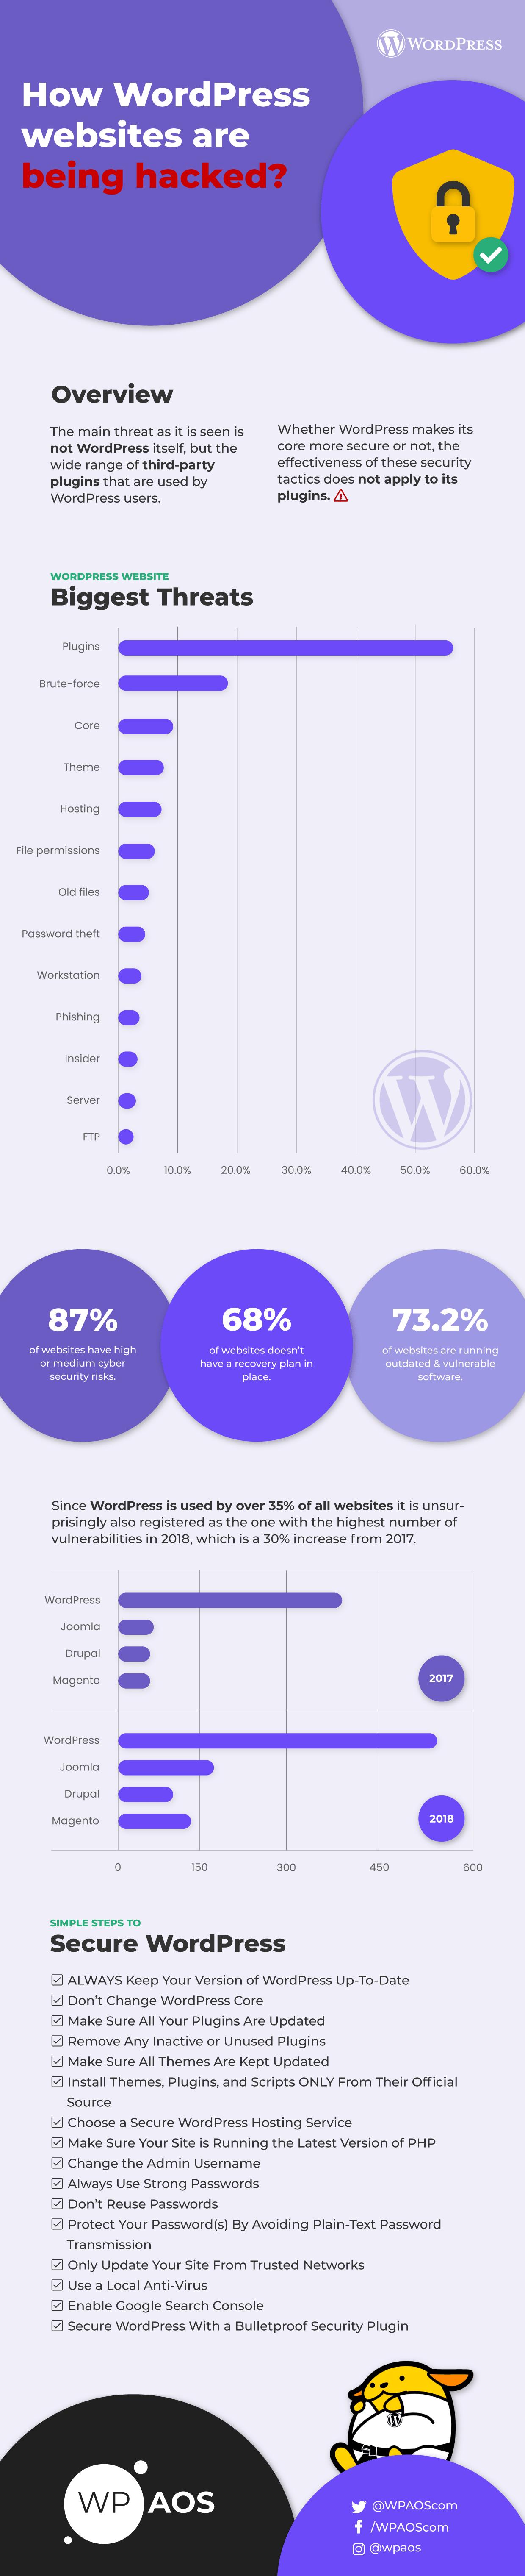 WordPress vulnerability statistics